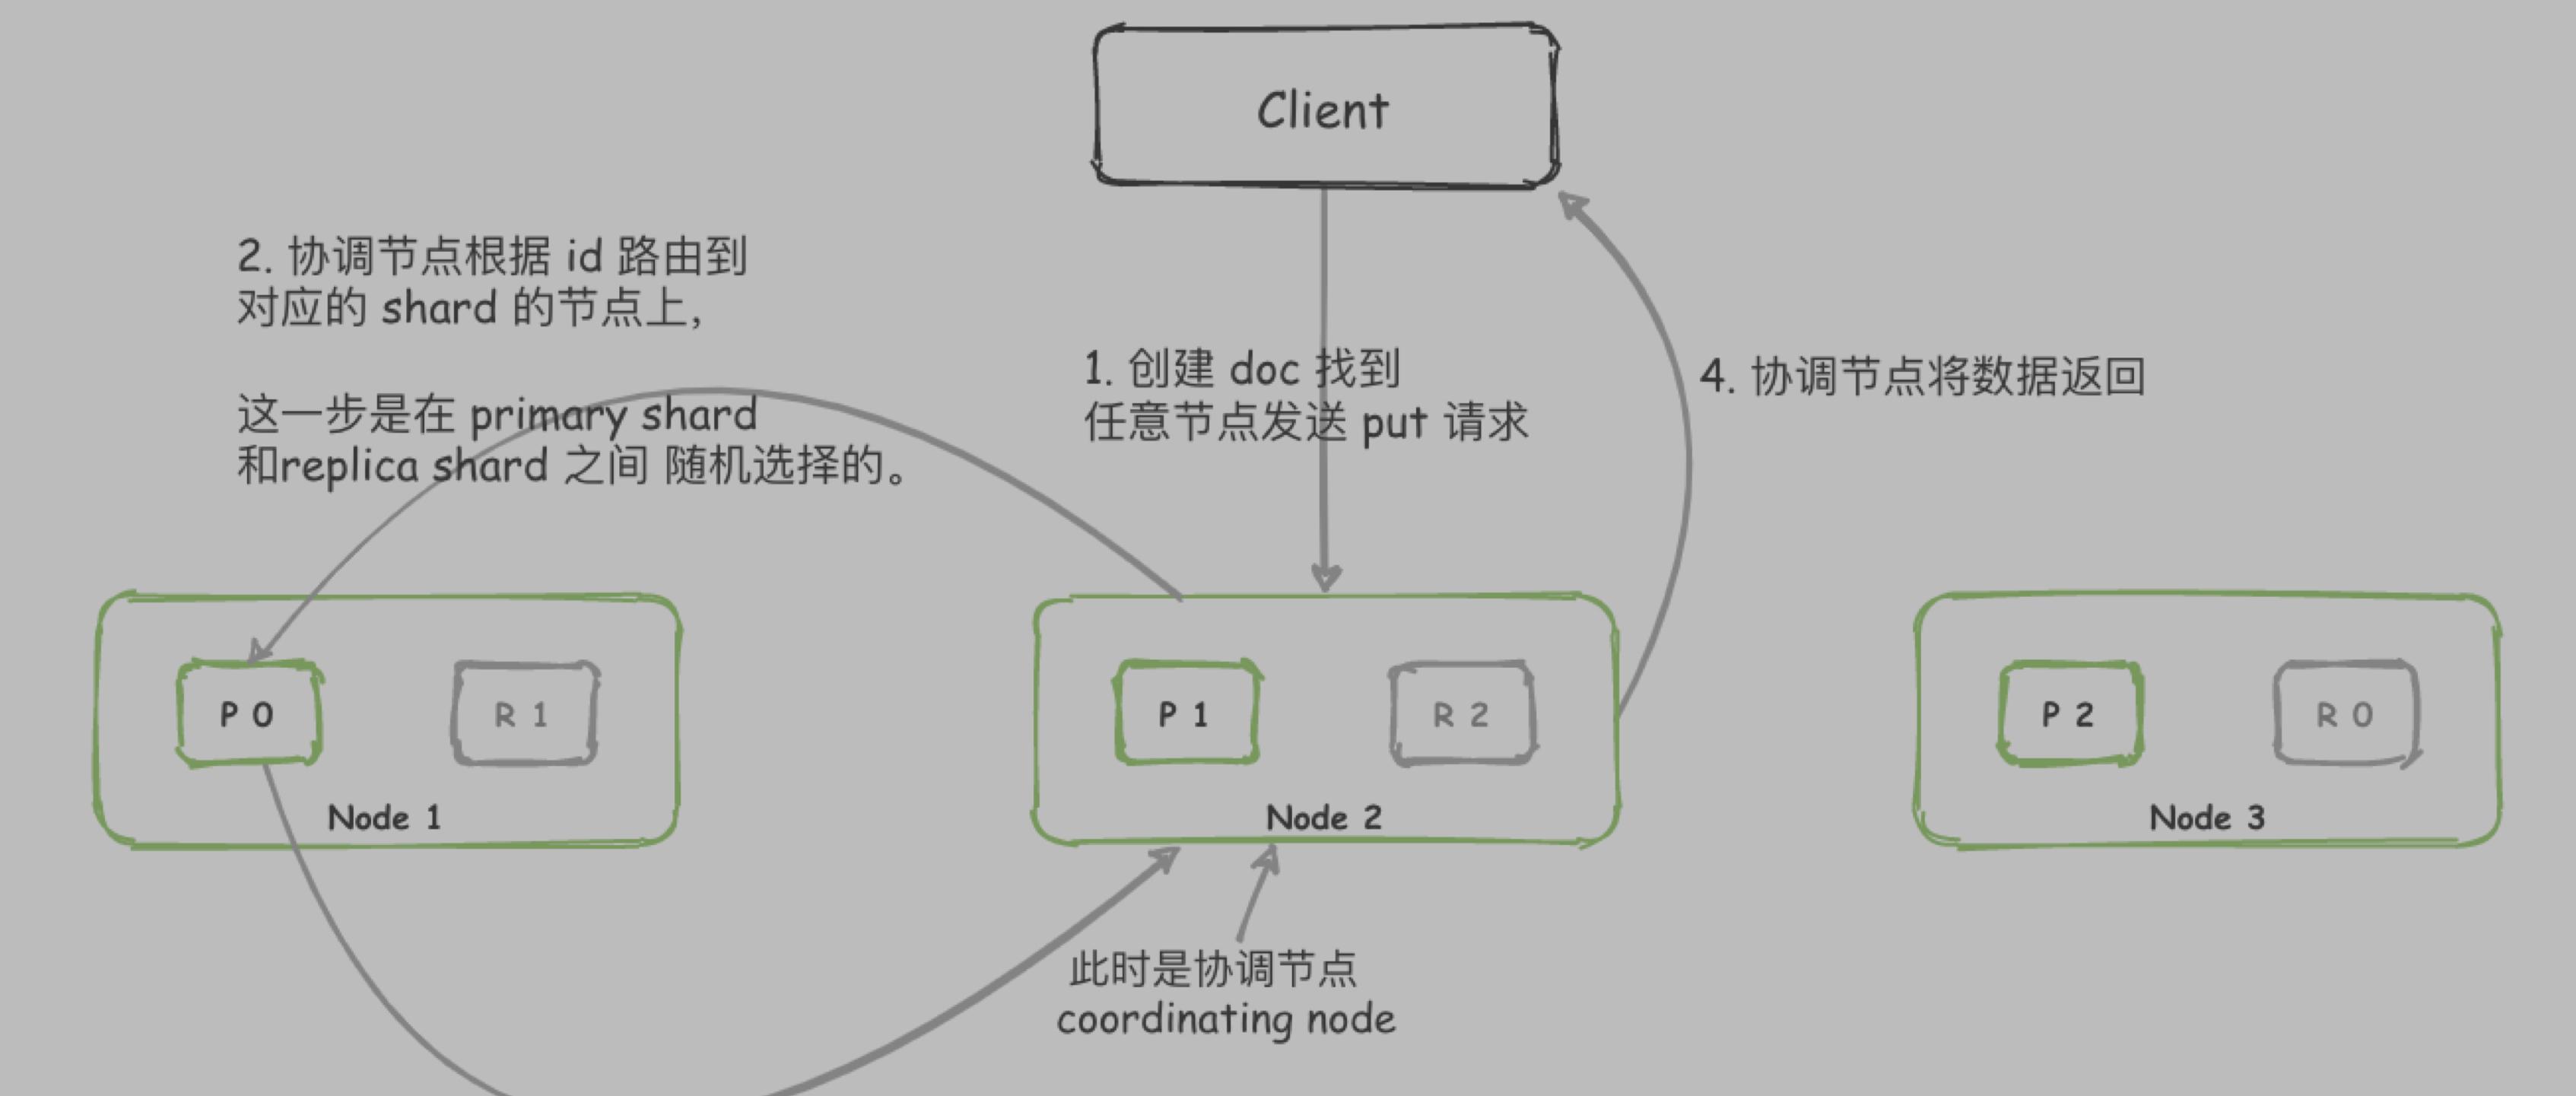 【Elasticsearch 技术分享】—— ES 查询检索数据的过程,是什么样子的?